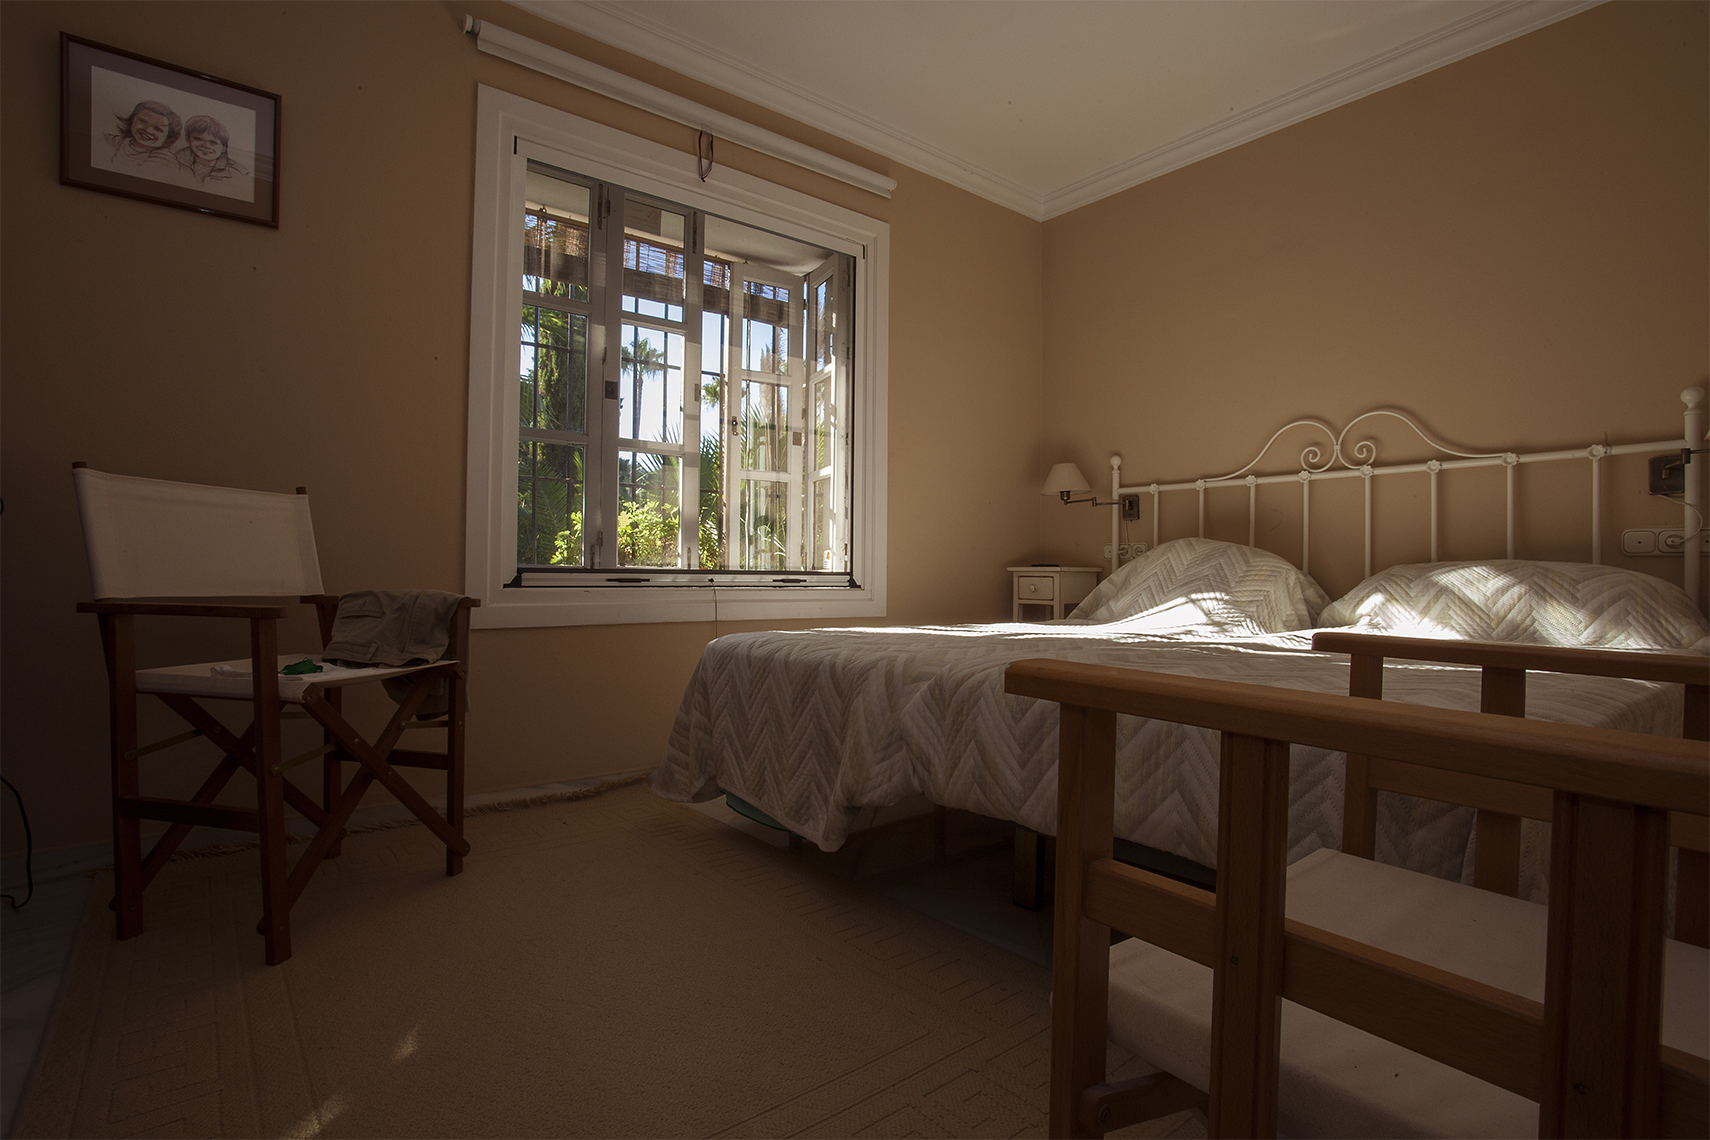 9-workshop-curso-fotografia-inmobiliaria-fotografo-malaga-marbella-profesional